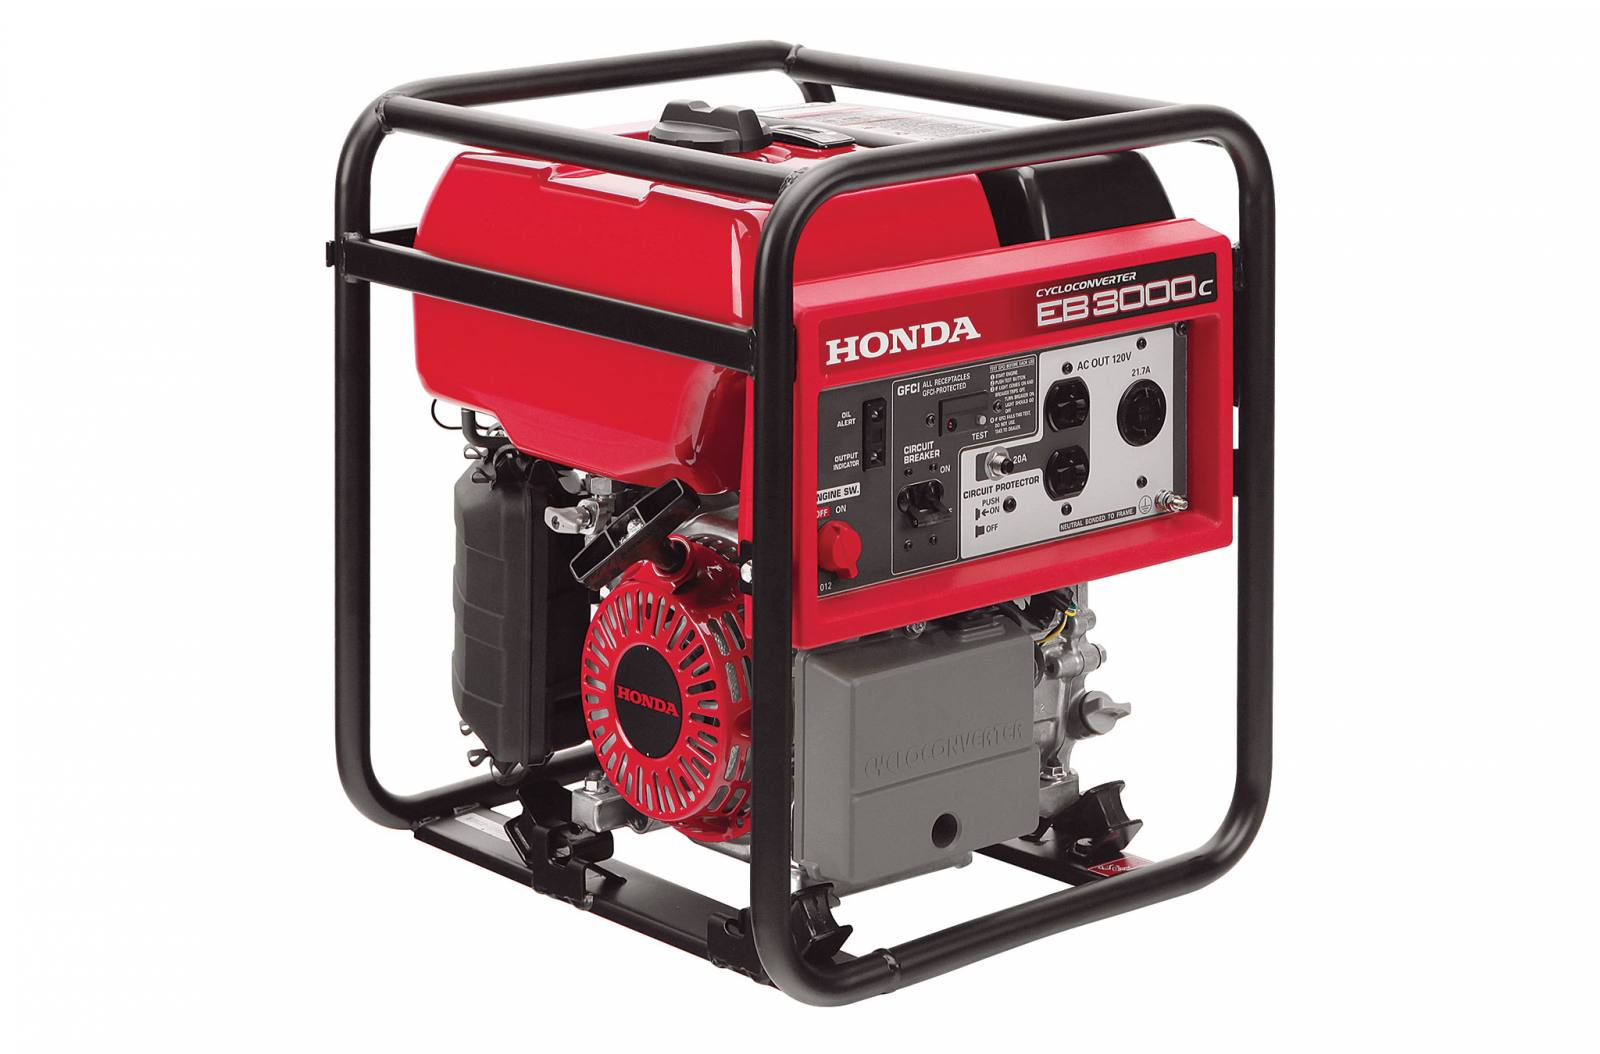 Honda Eb5000 Wiring Diagram Library Gfci Circuit Breaker Furthermore 2015 Power Equipment Eb3000c